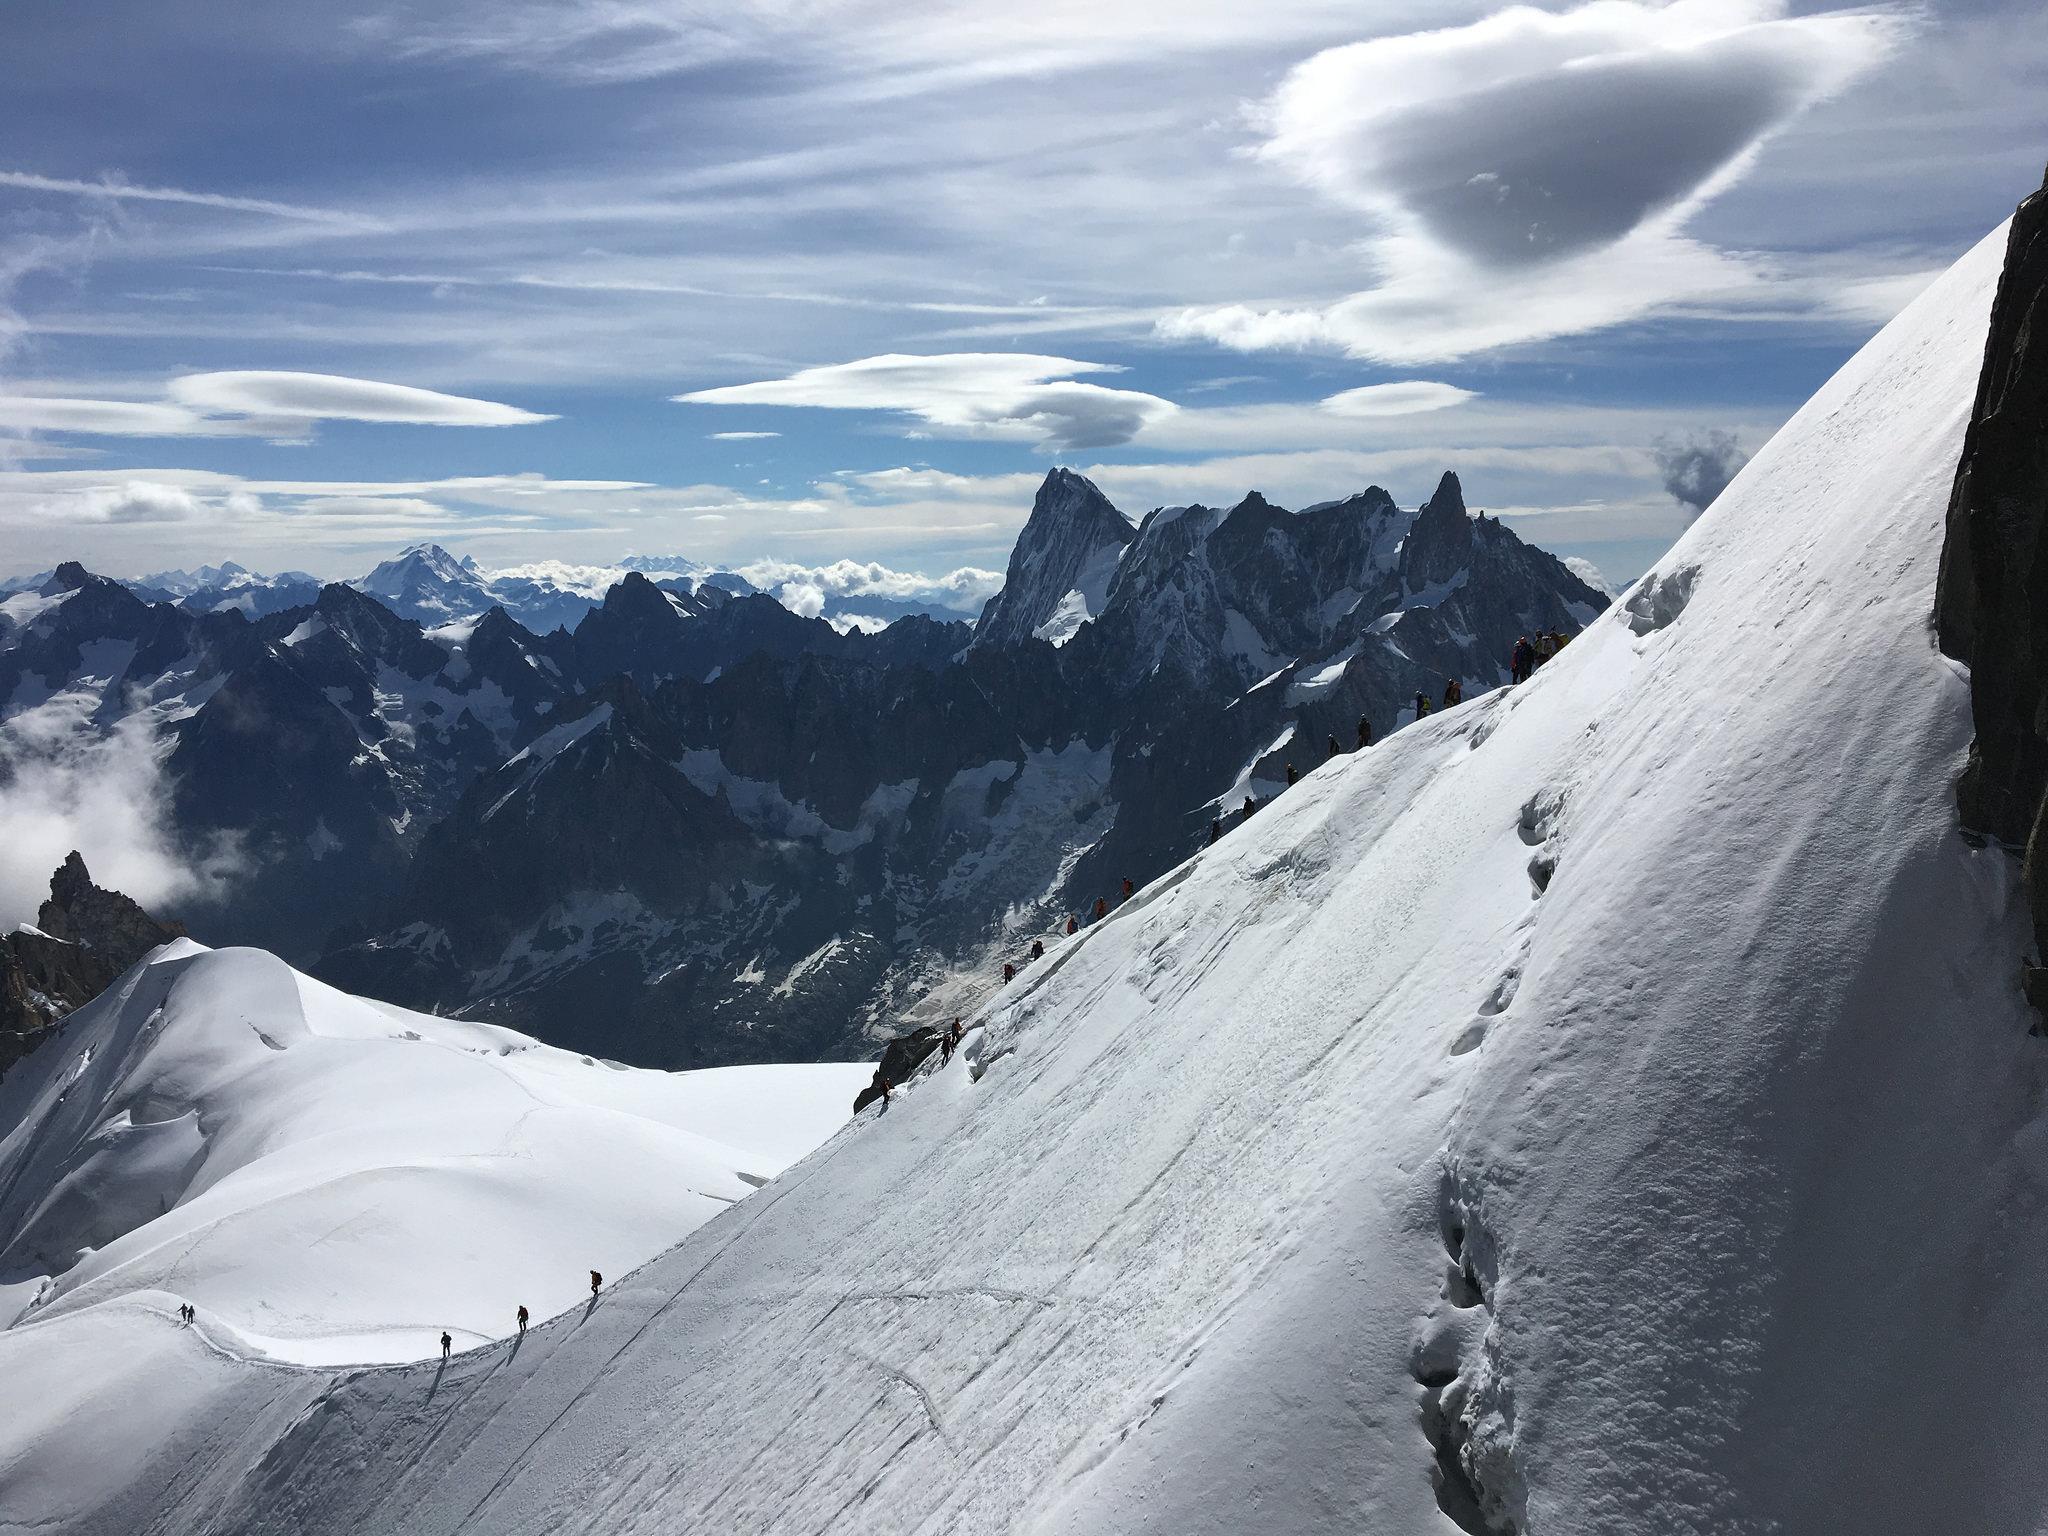 mt blanc snow climbers ahead